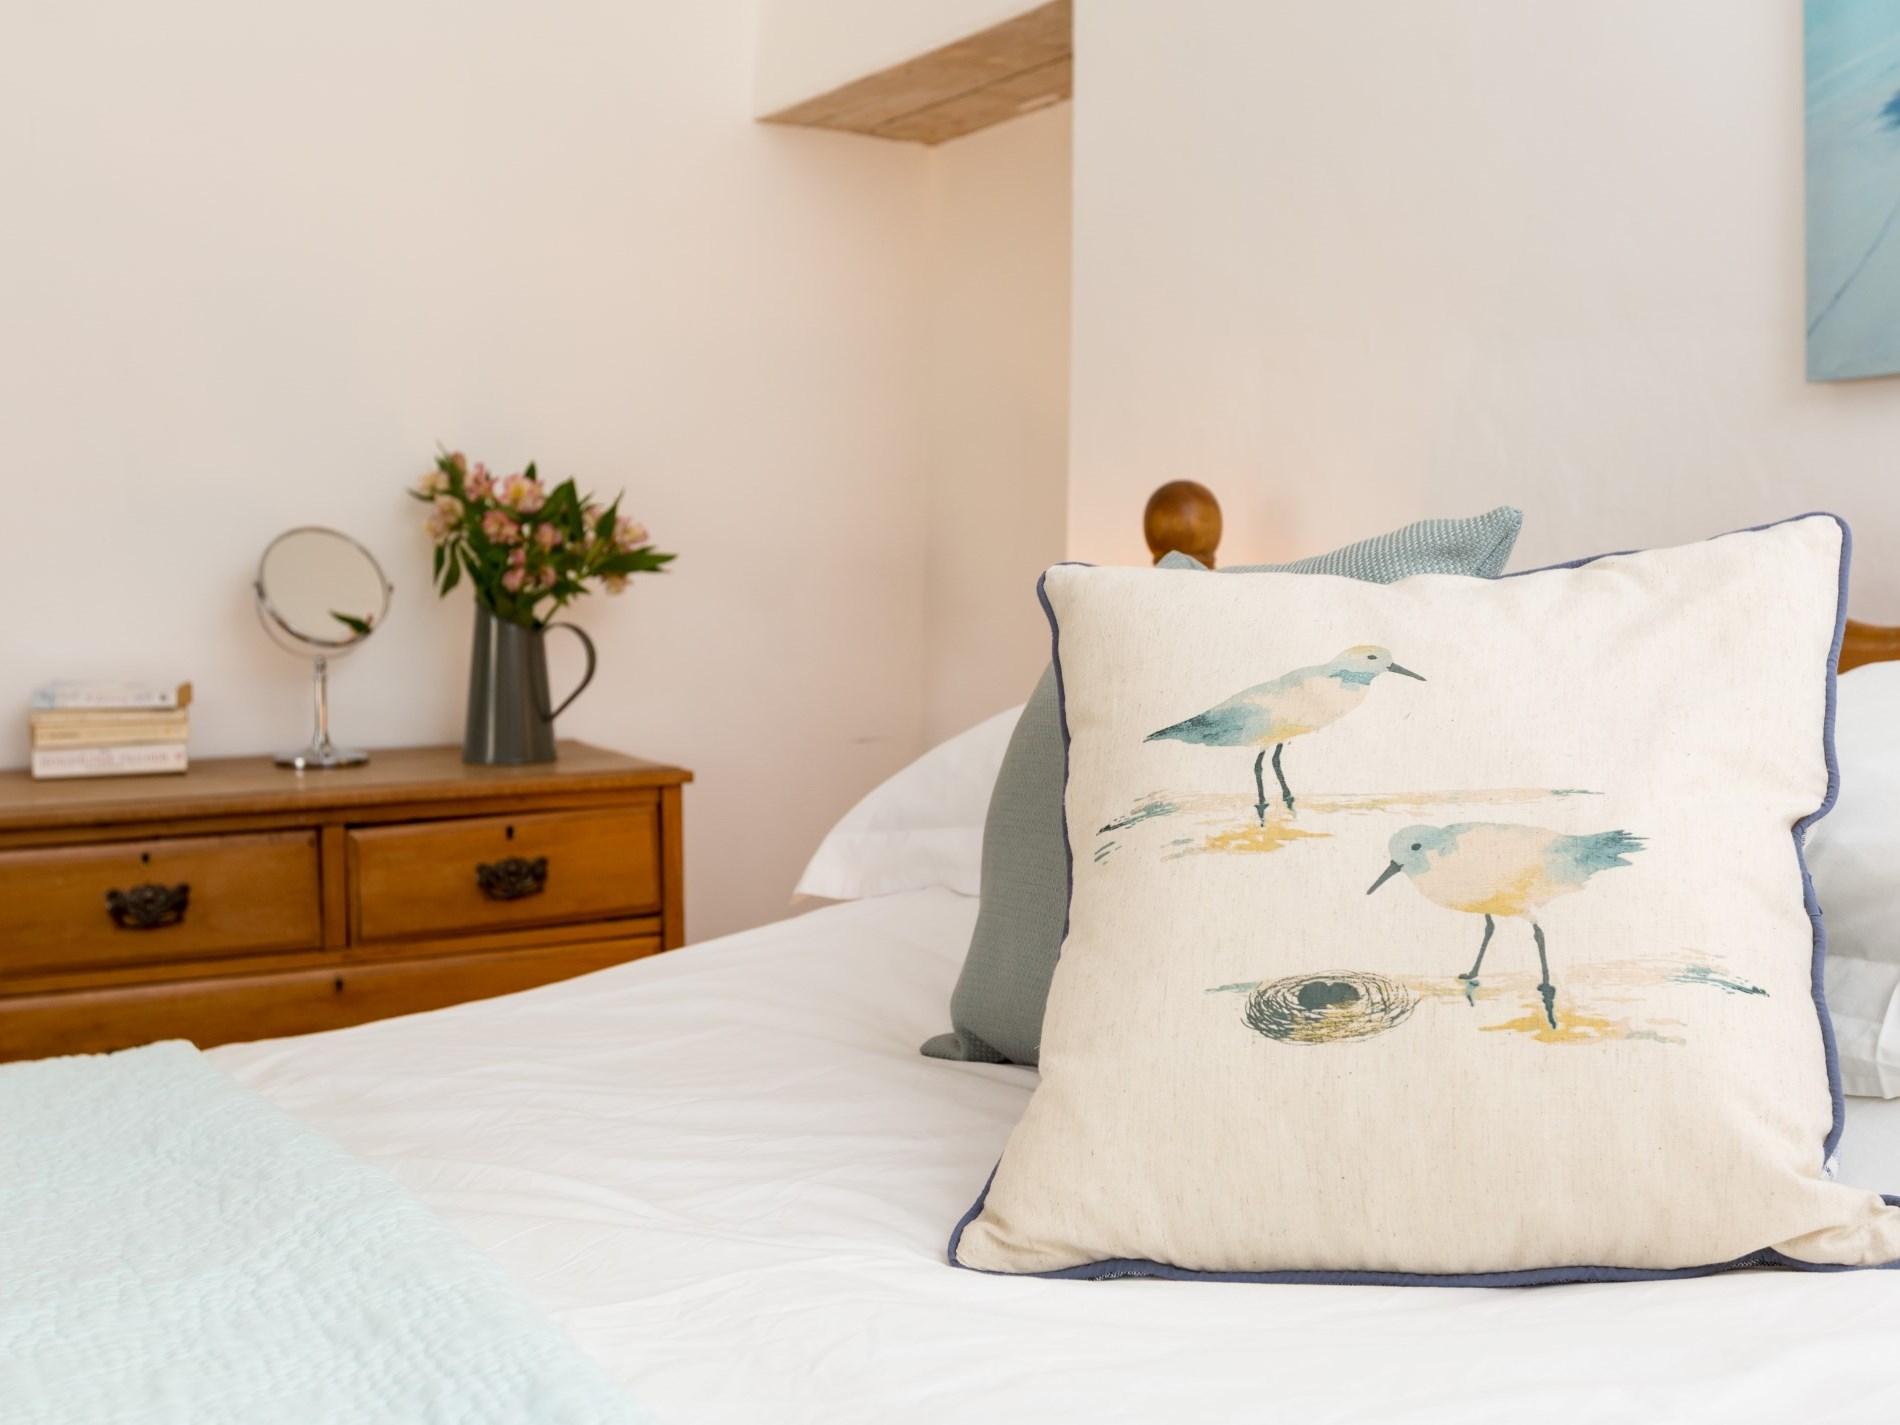 Bedroom with fauna décor